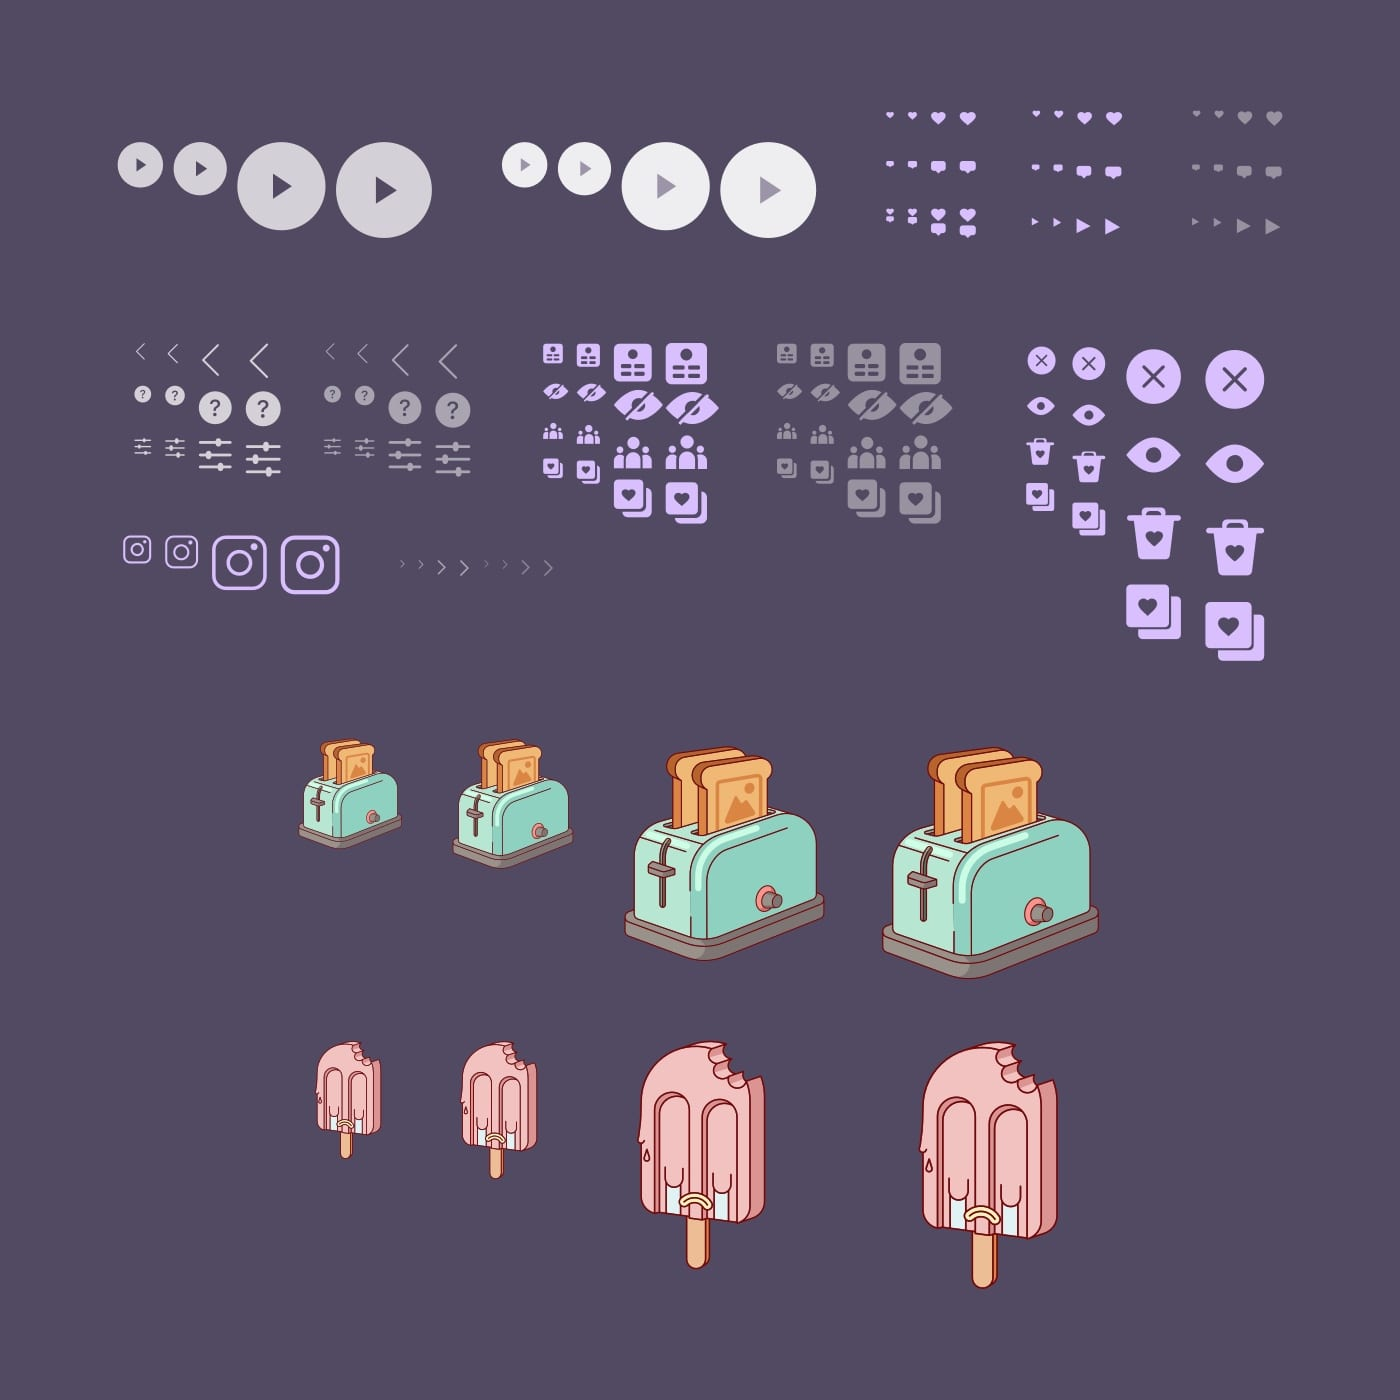 fm-2-icons/i/icns